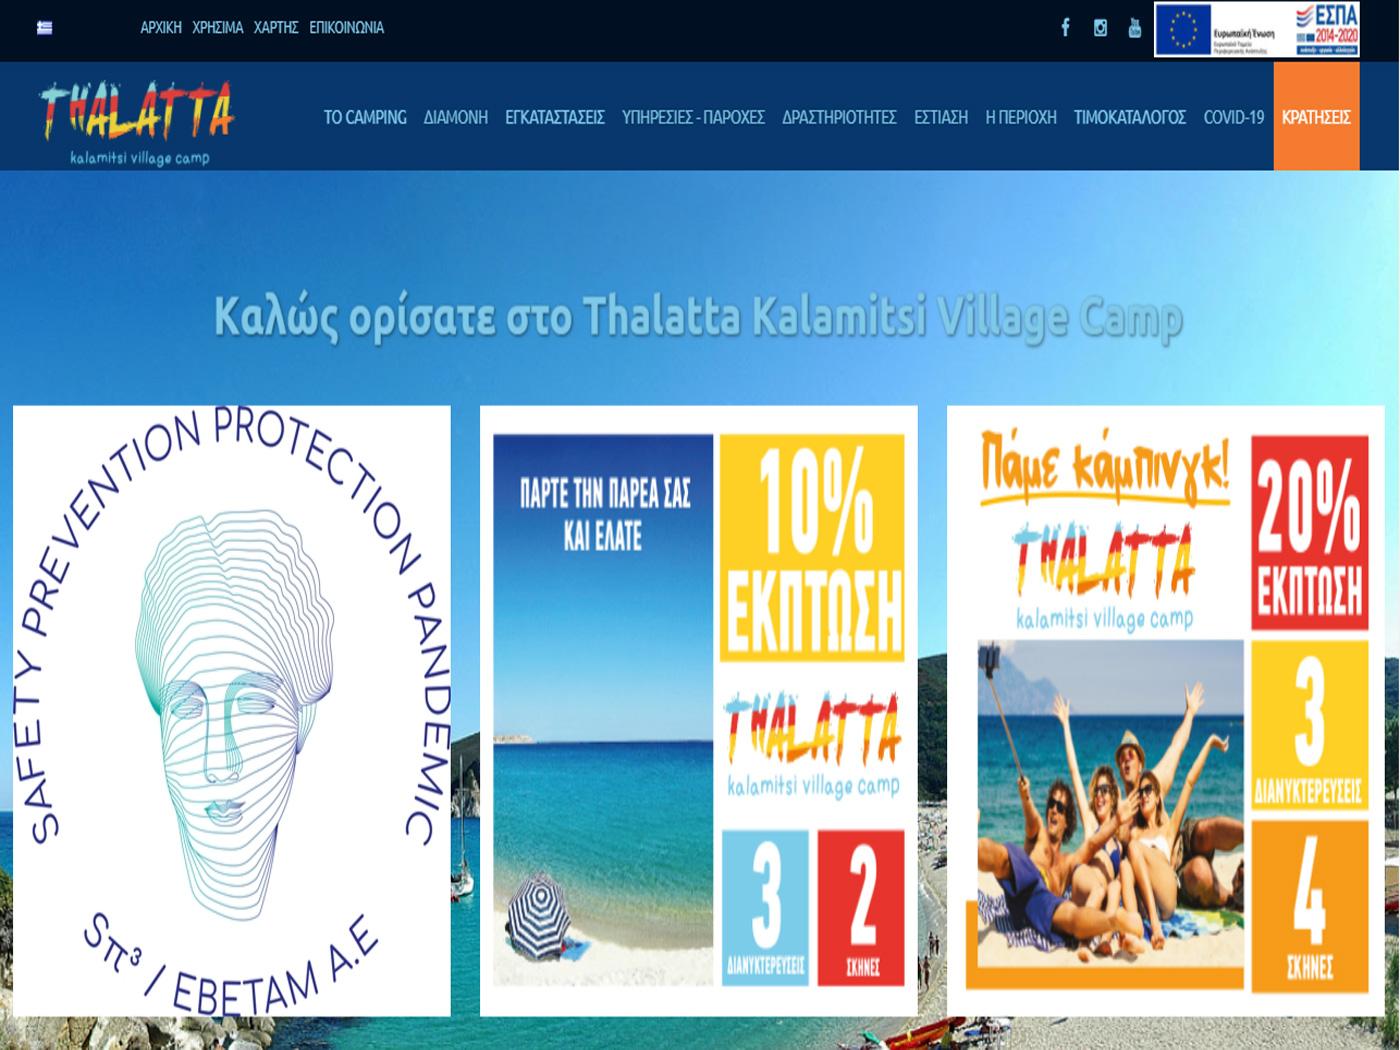 Google ads διαφημίσεις για την ιστοσελίδα Thalattacamp.gr